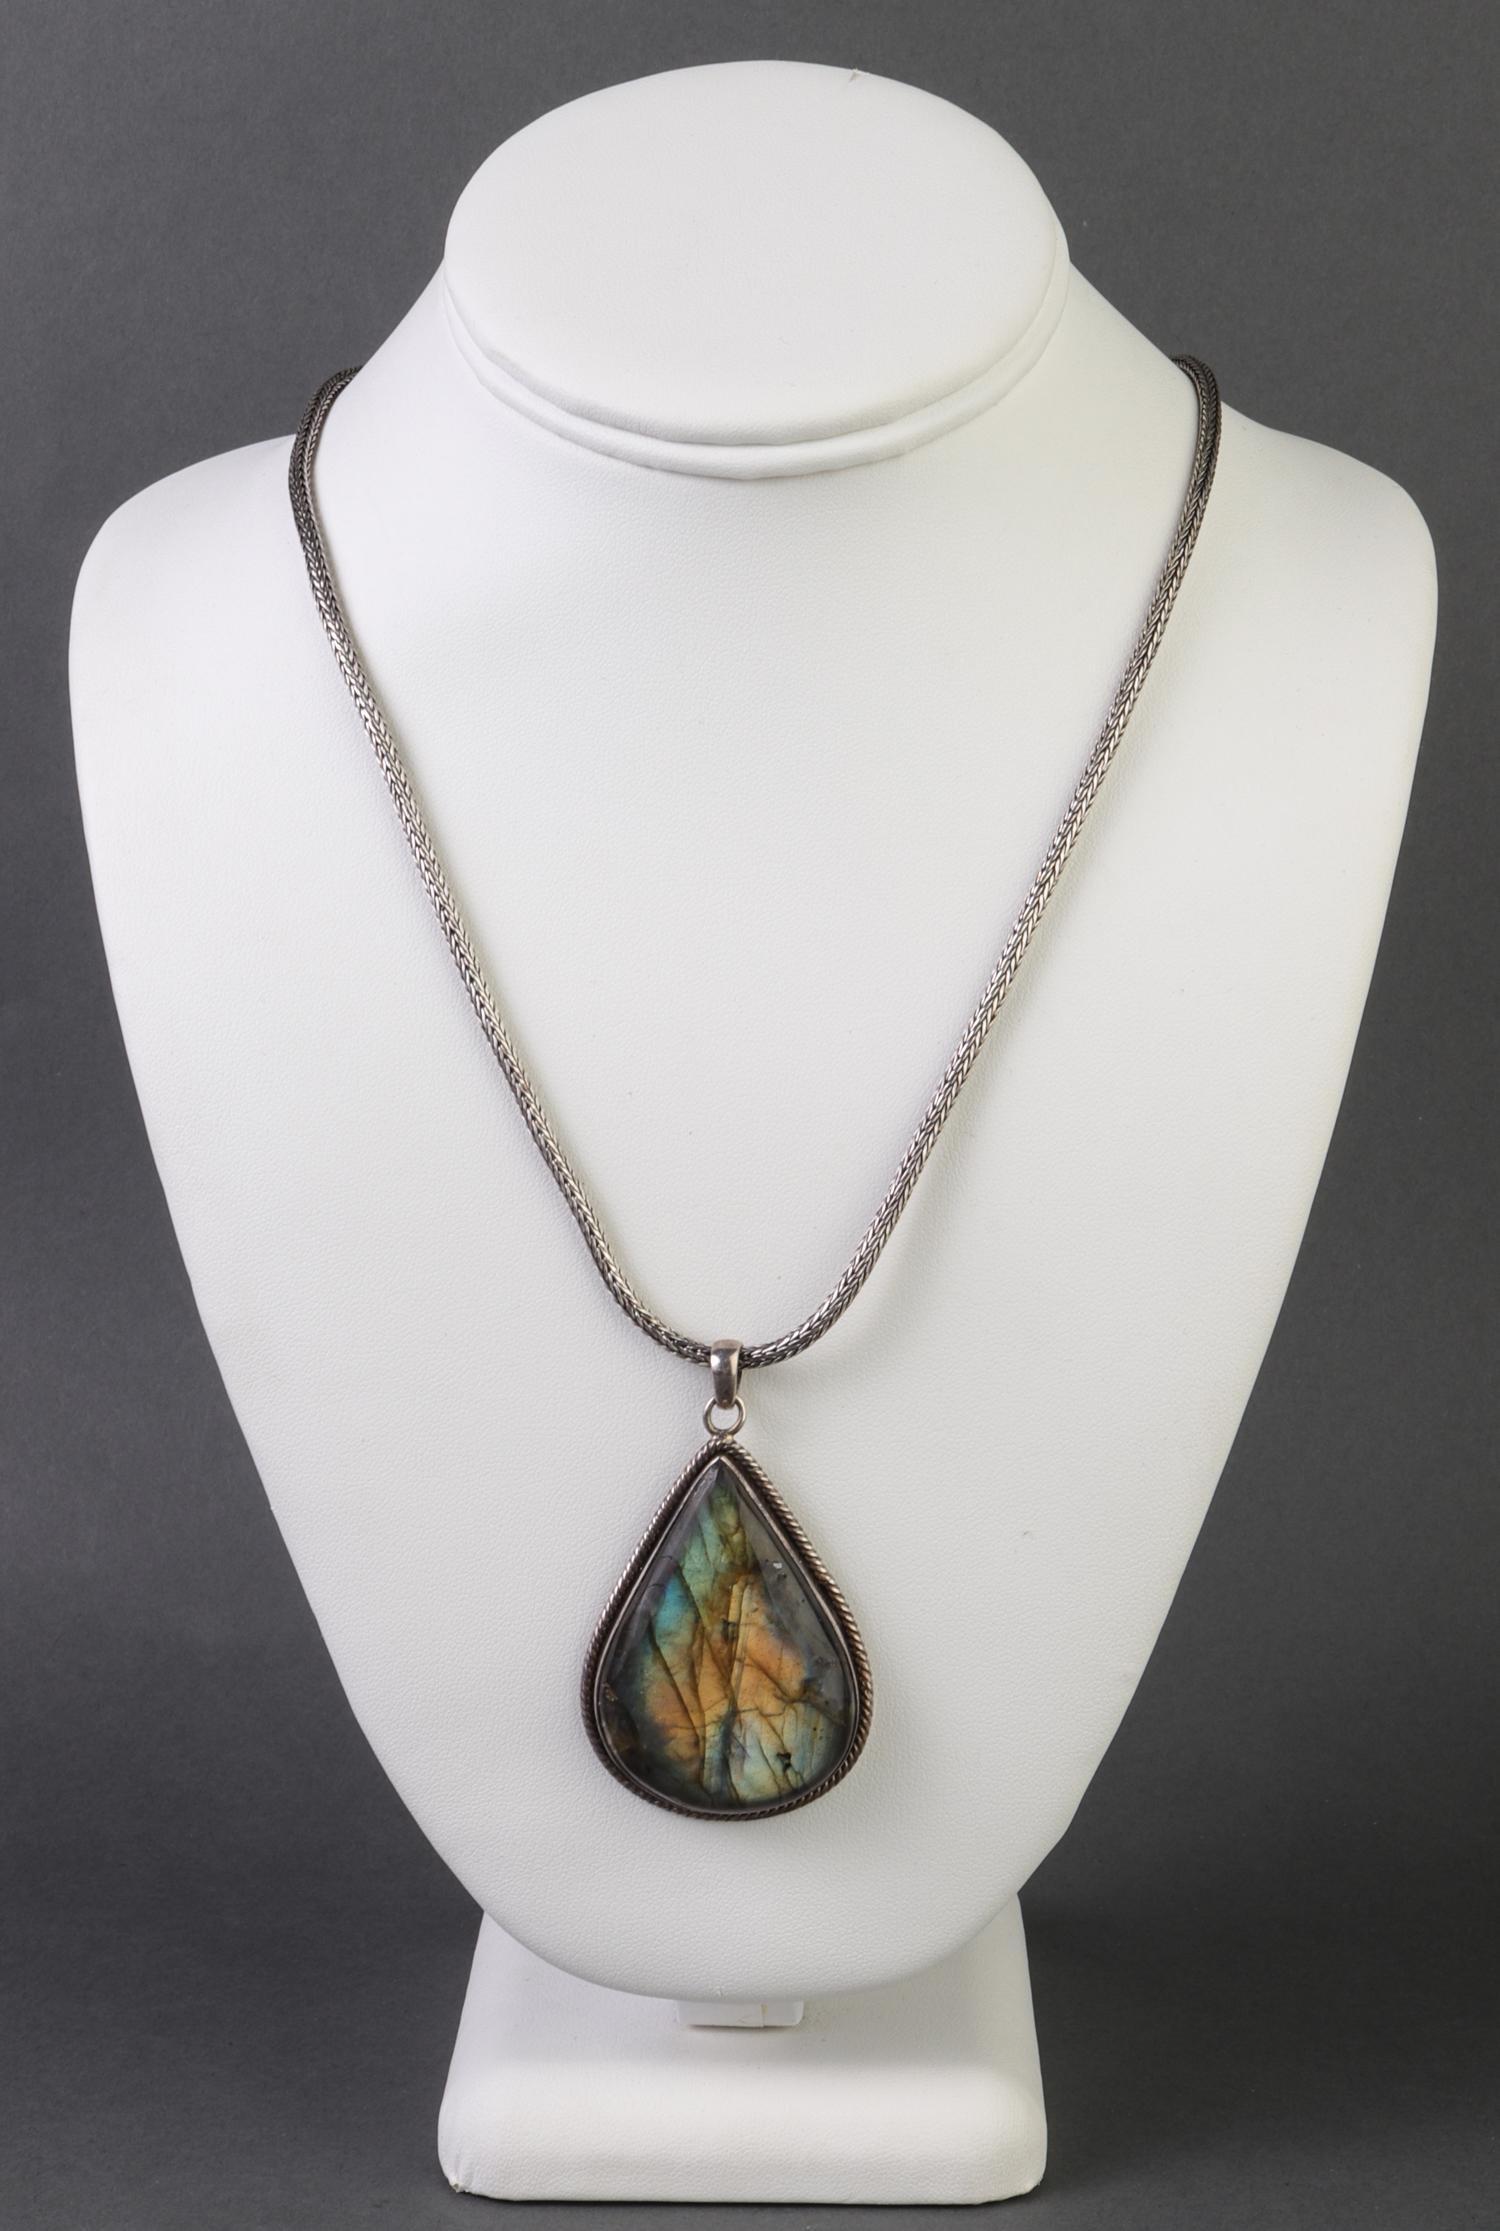 Sterling Silver & Labradorite Pendant Necklace